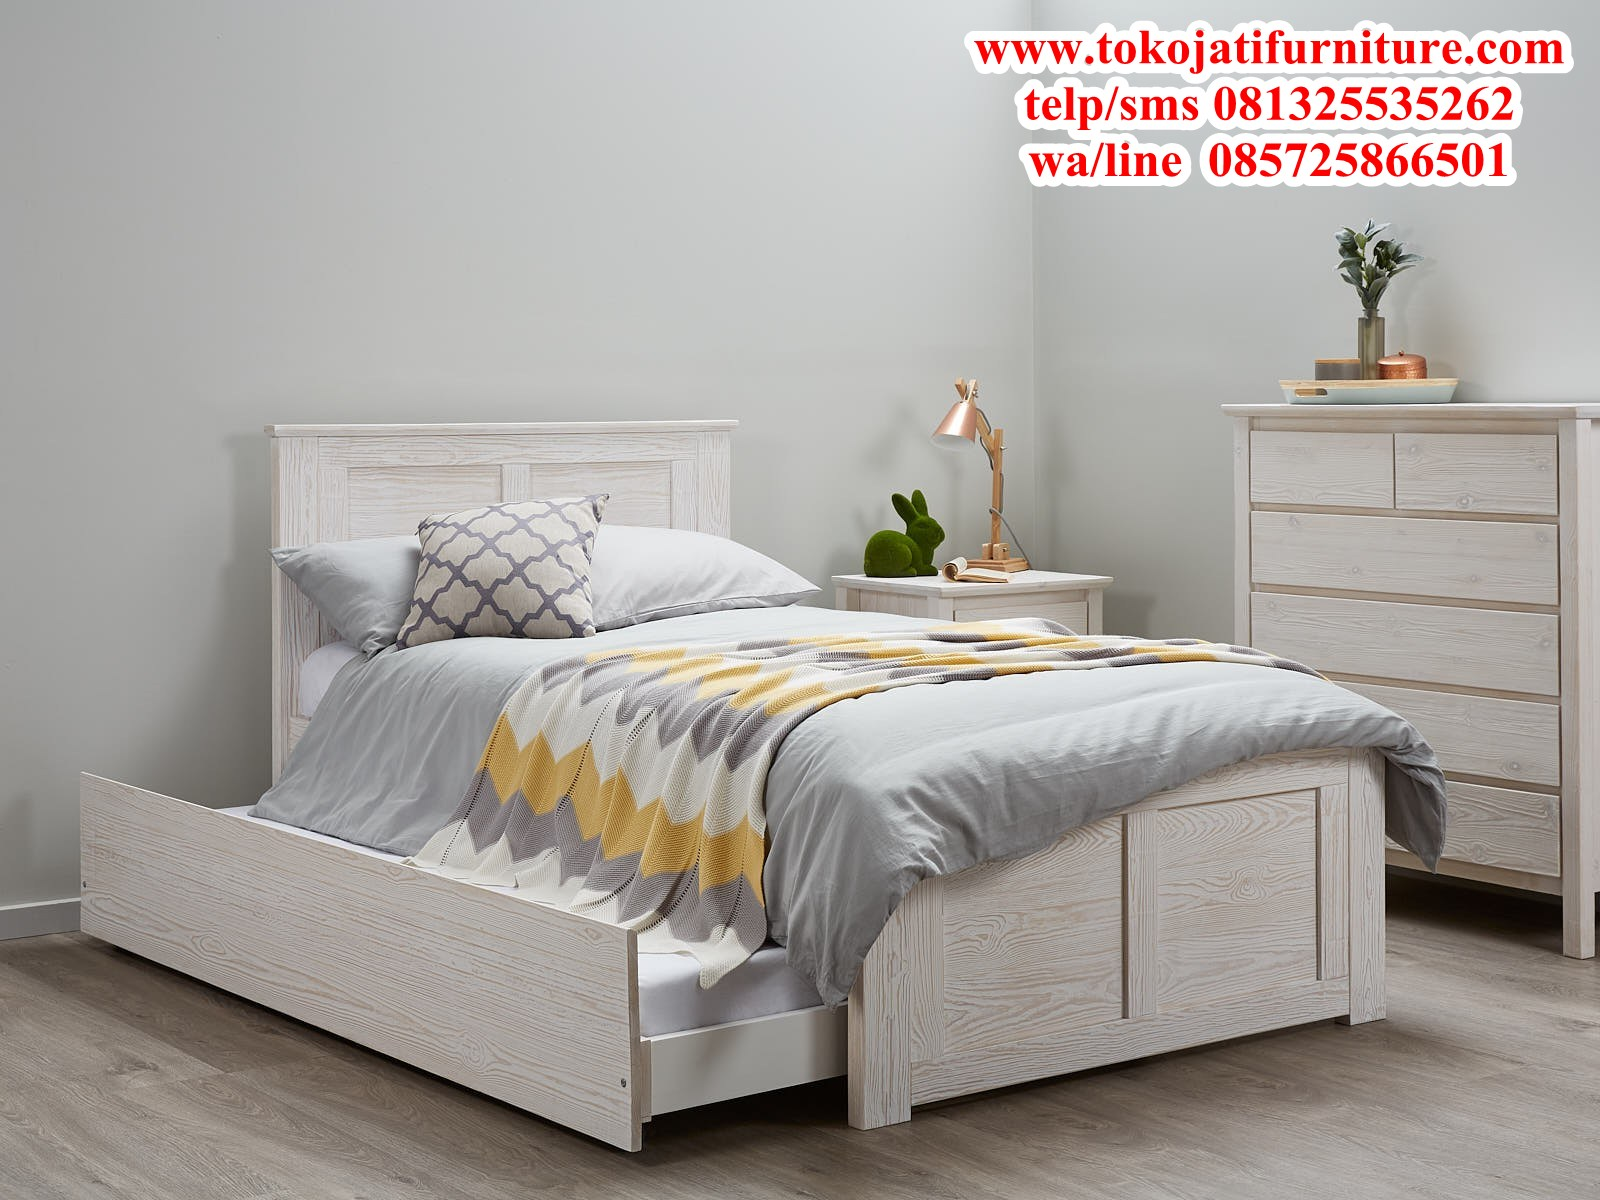 tempat-tidur-anak-duco-single tempat tidur anak duco single